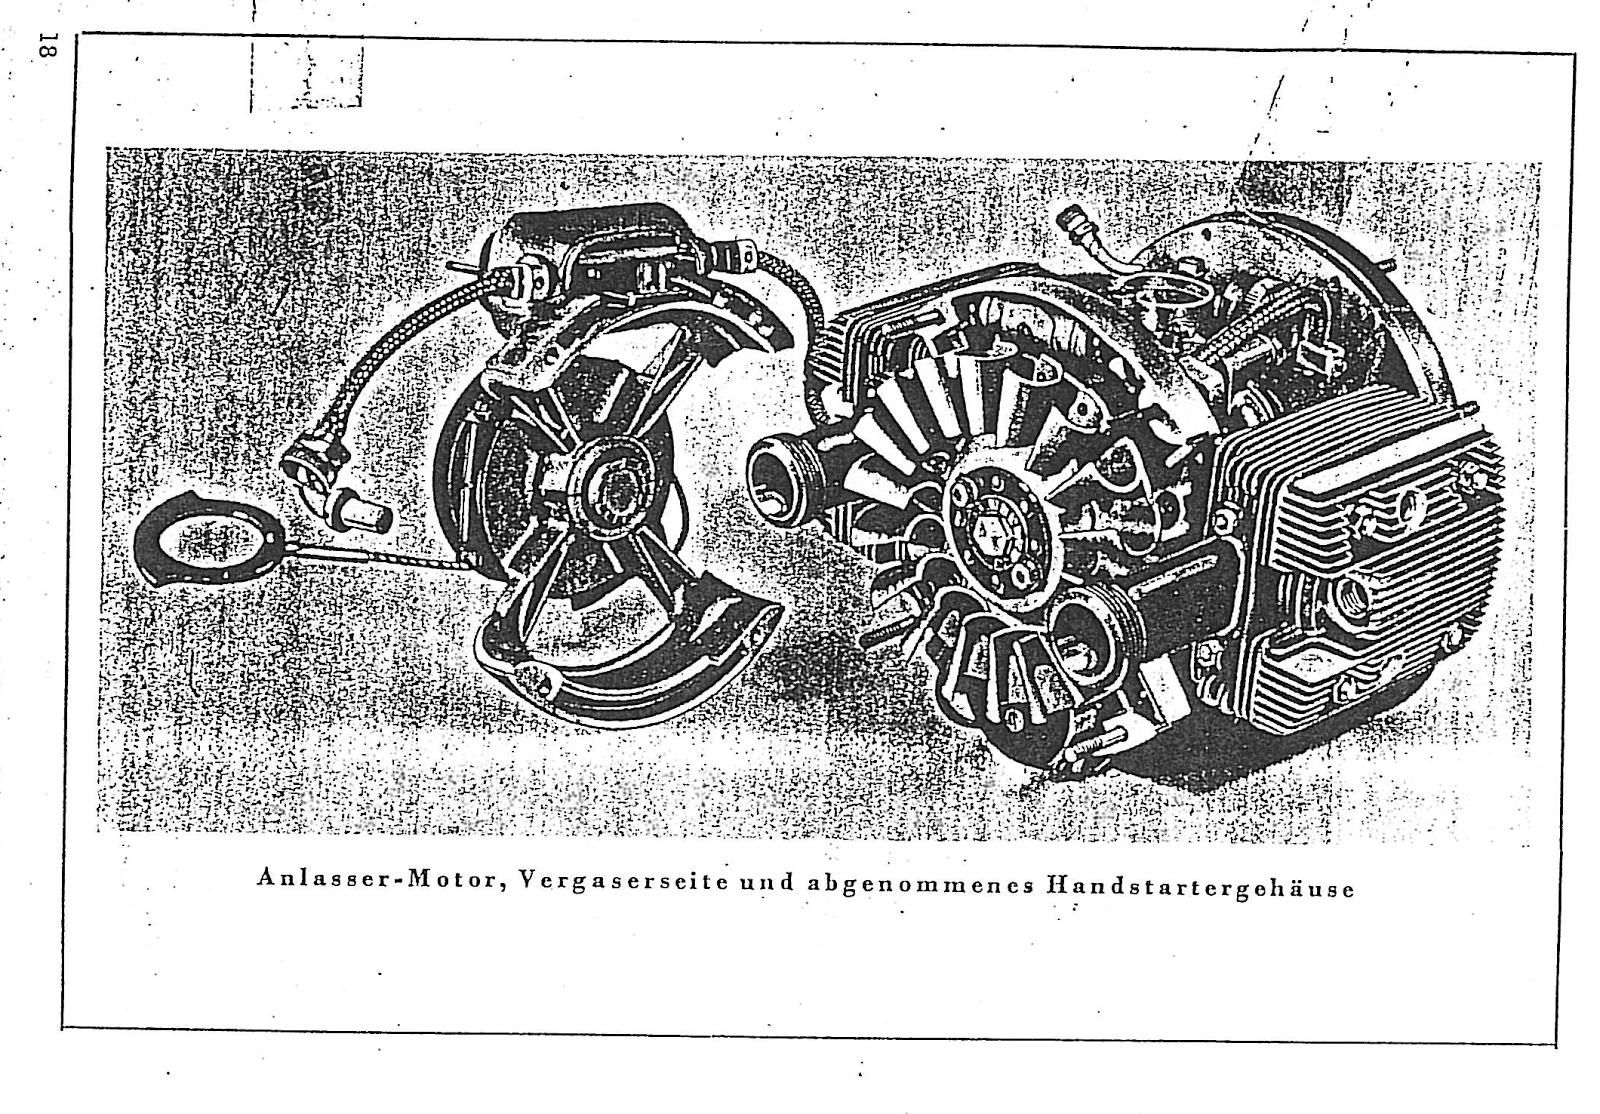 Riedel Anlassermotor starter motor